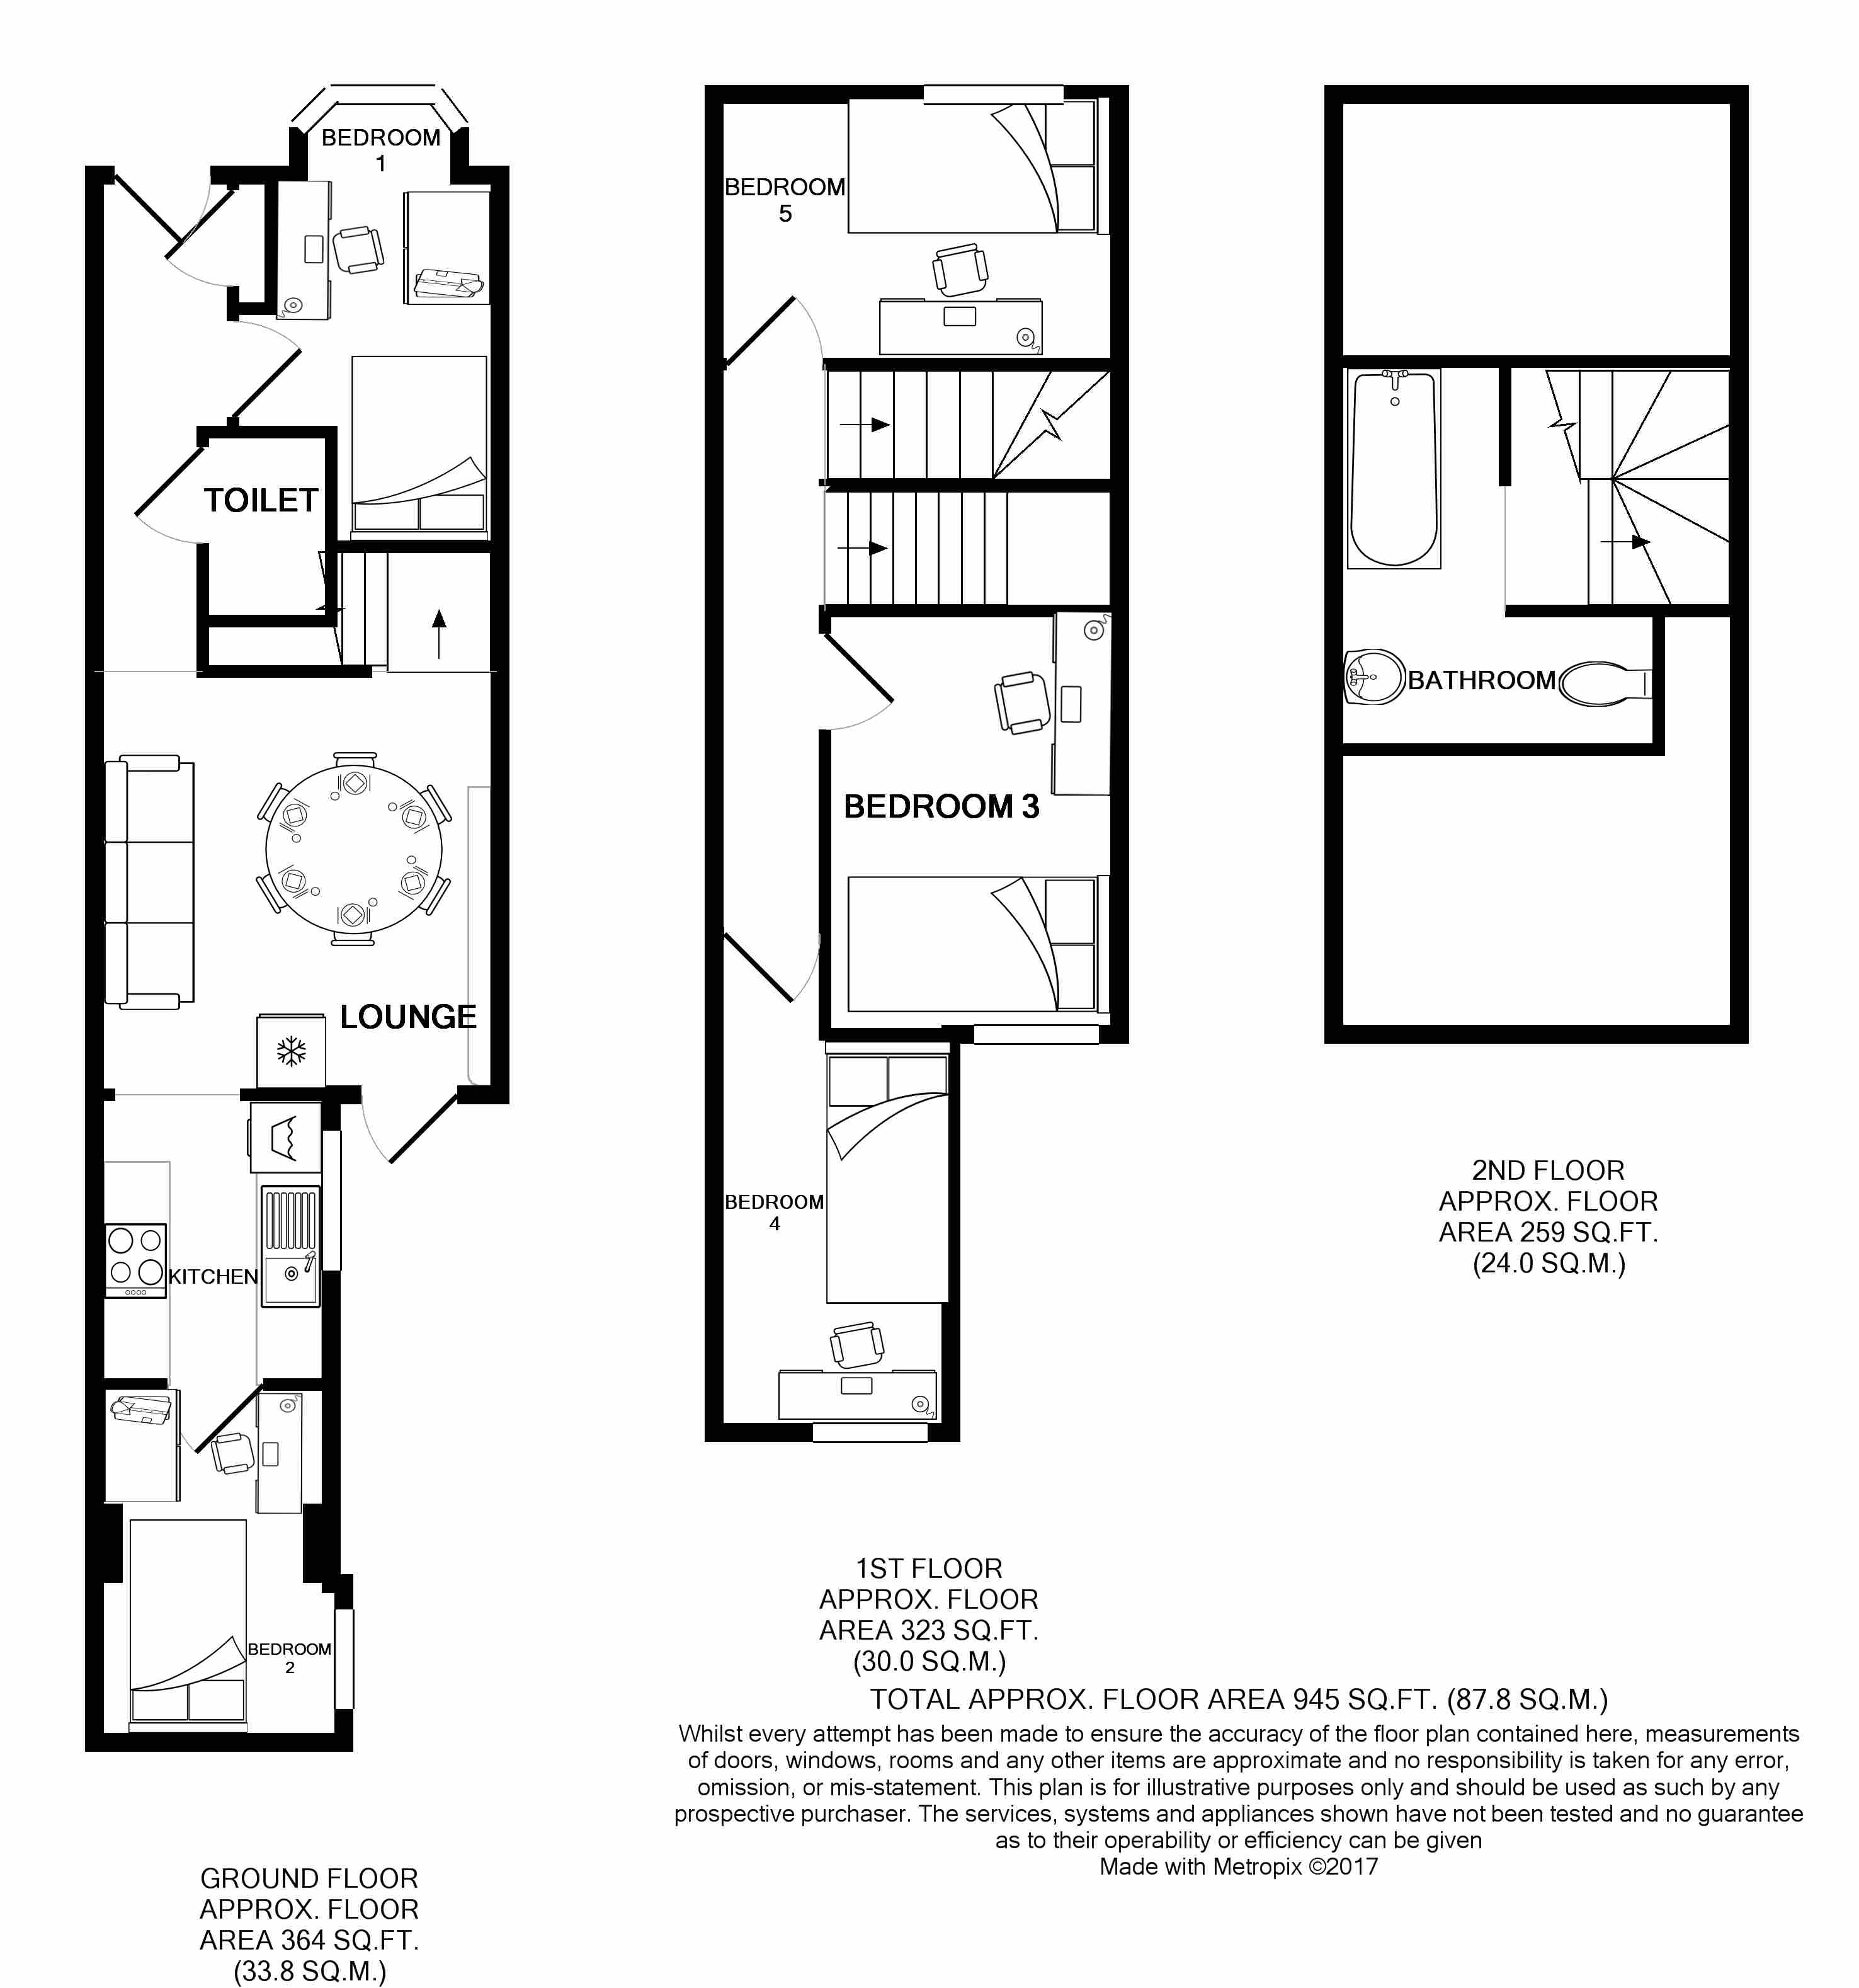 231 Leek Road Floorplans